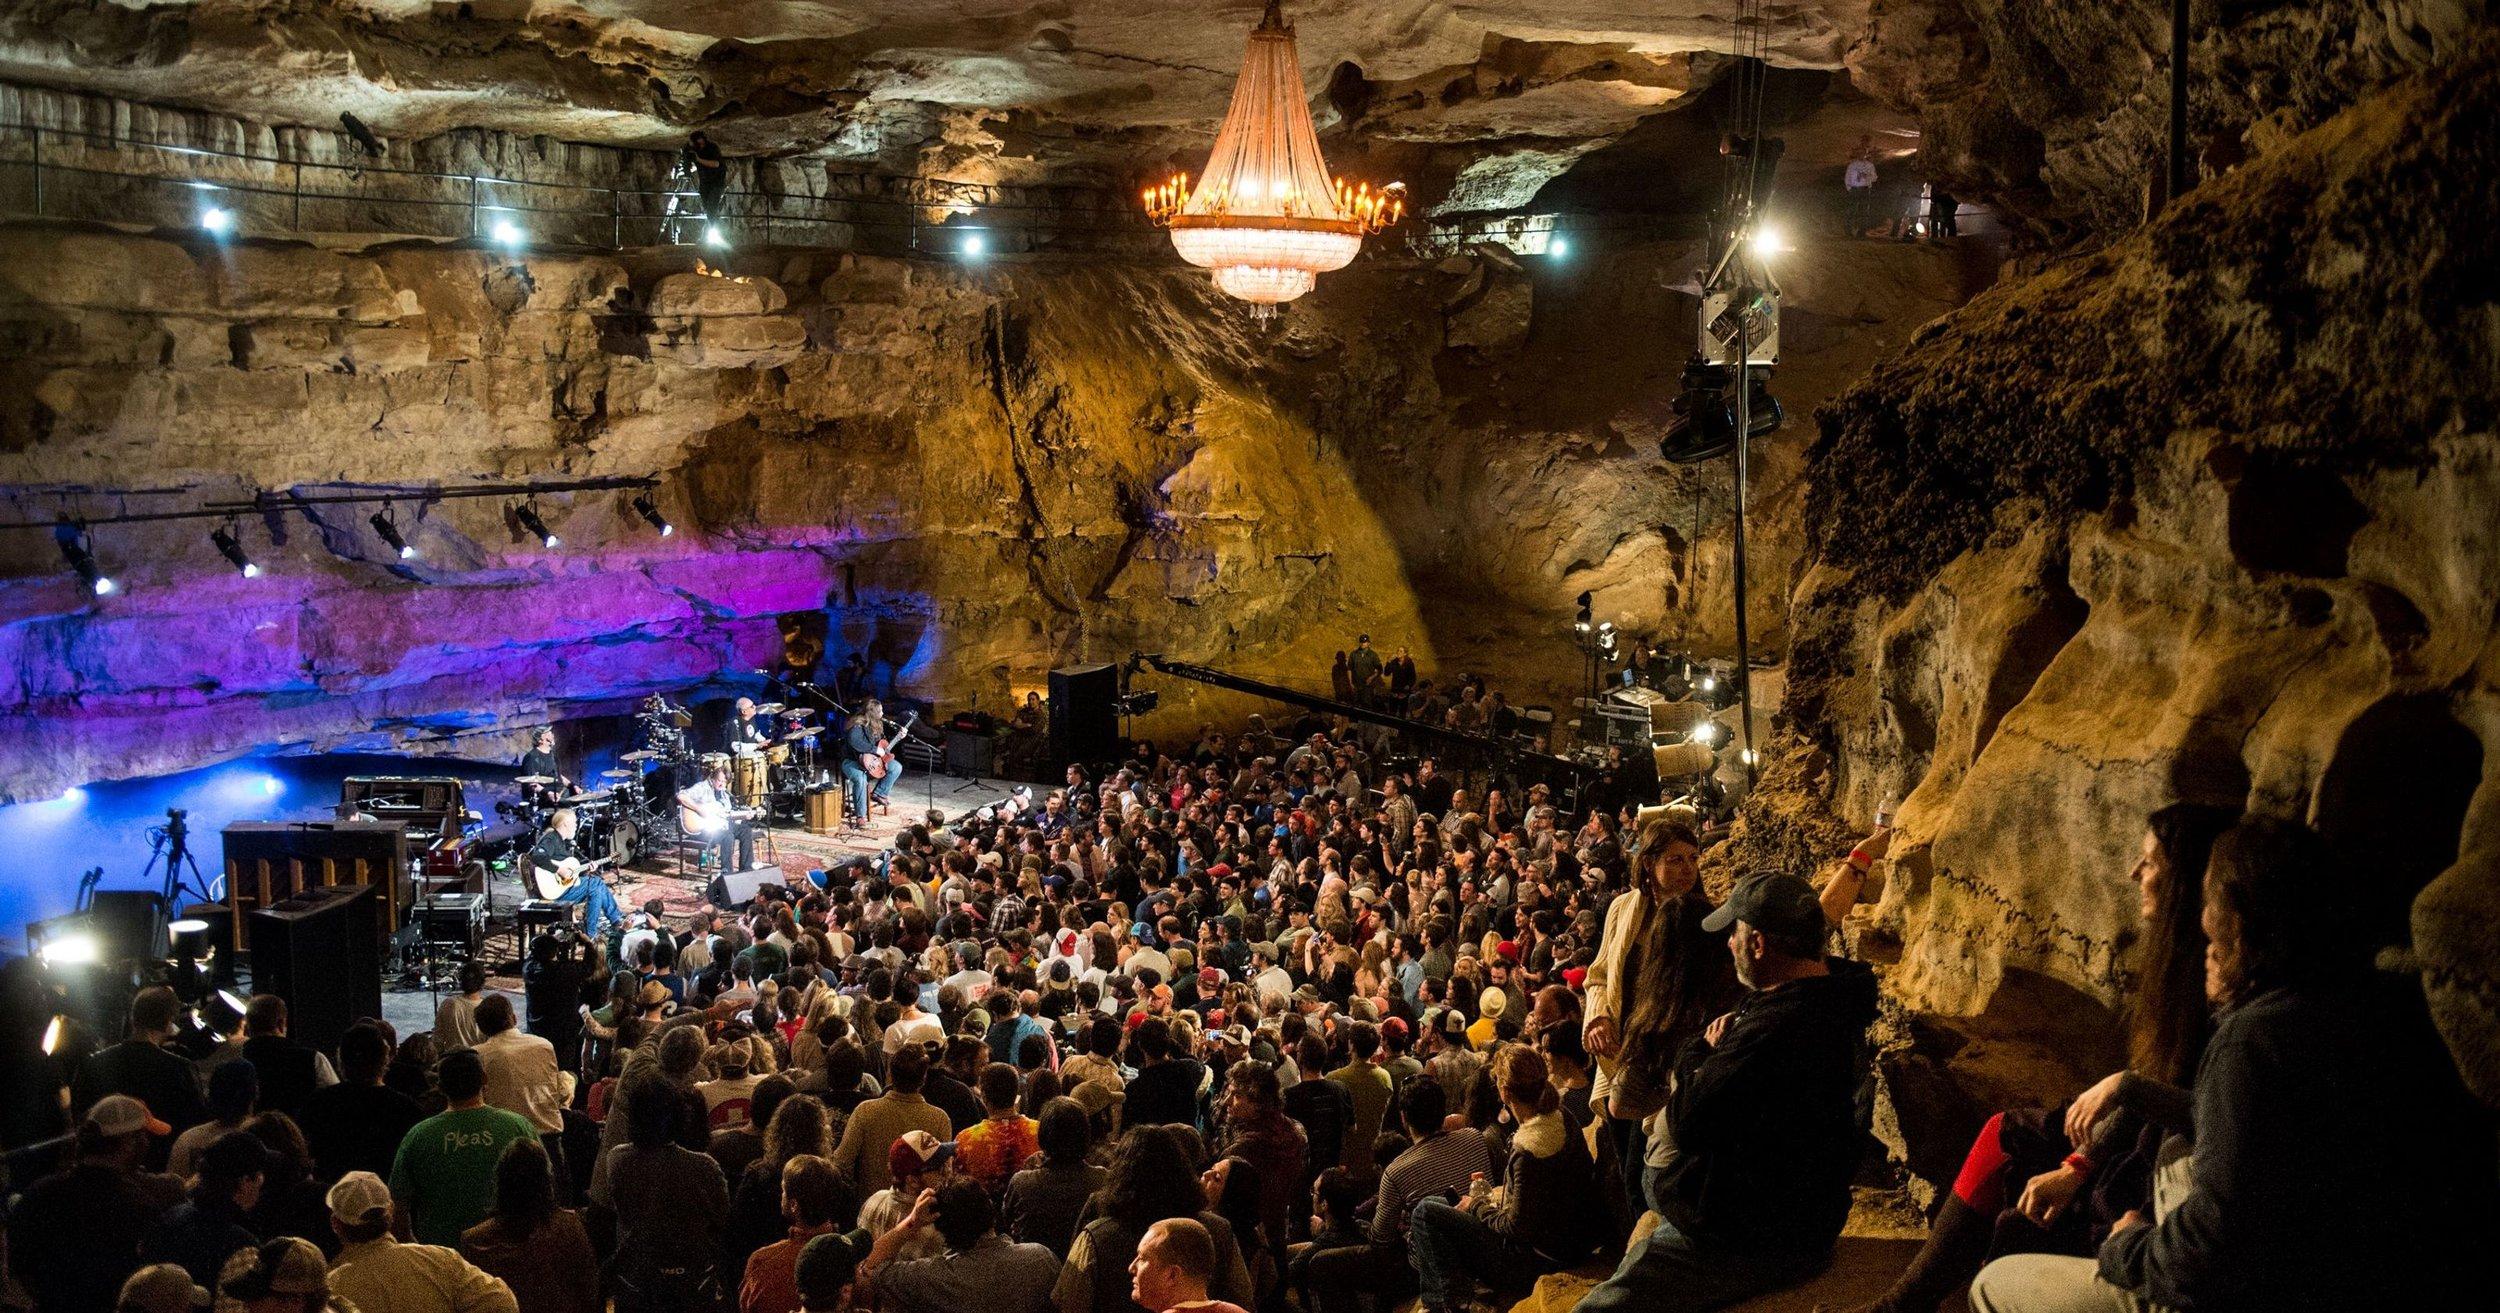 BLUEGRASS UNDERGROUND - Volcano Room, Cumberland Caverns, TN